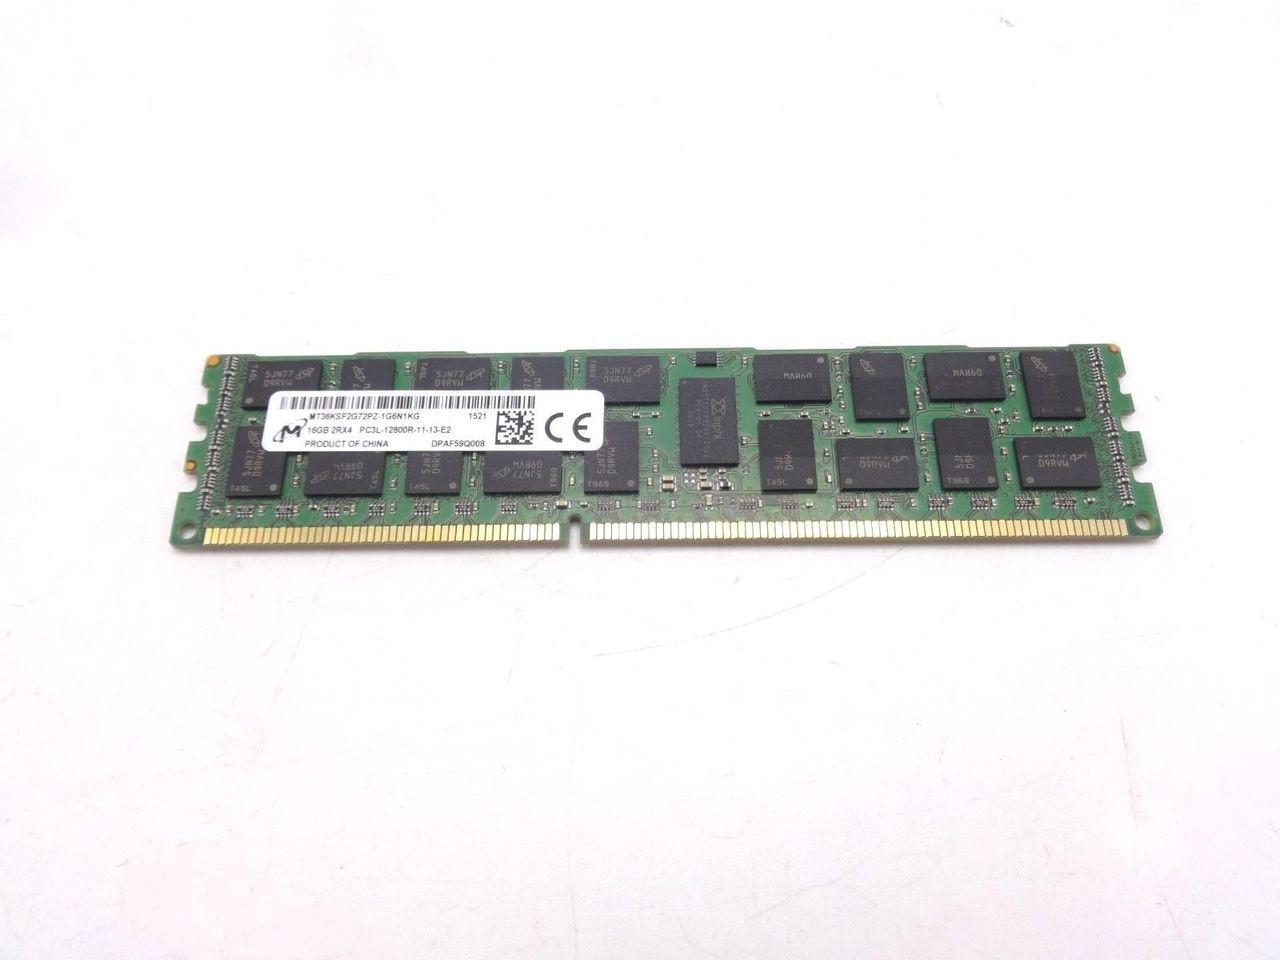 Micron MT36KSF2G72PZ-1G6N1 16GB PC3L 12800R 2Rx4 Memory Dimm